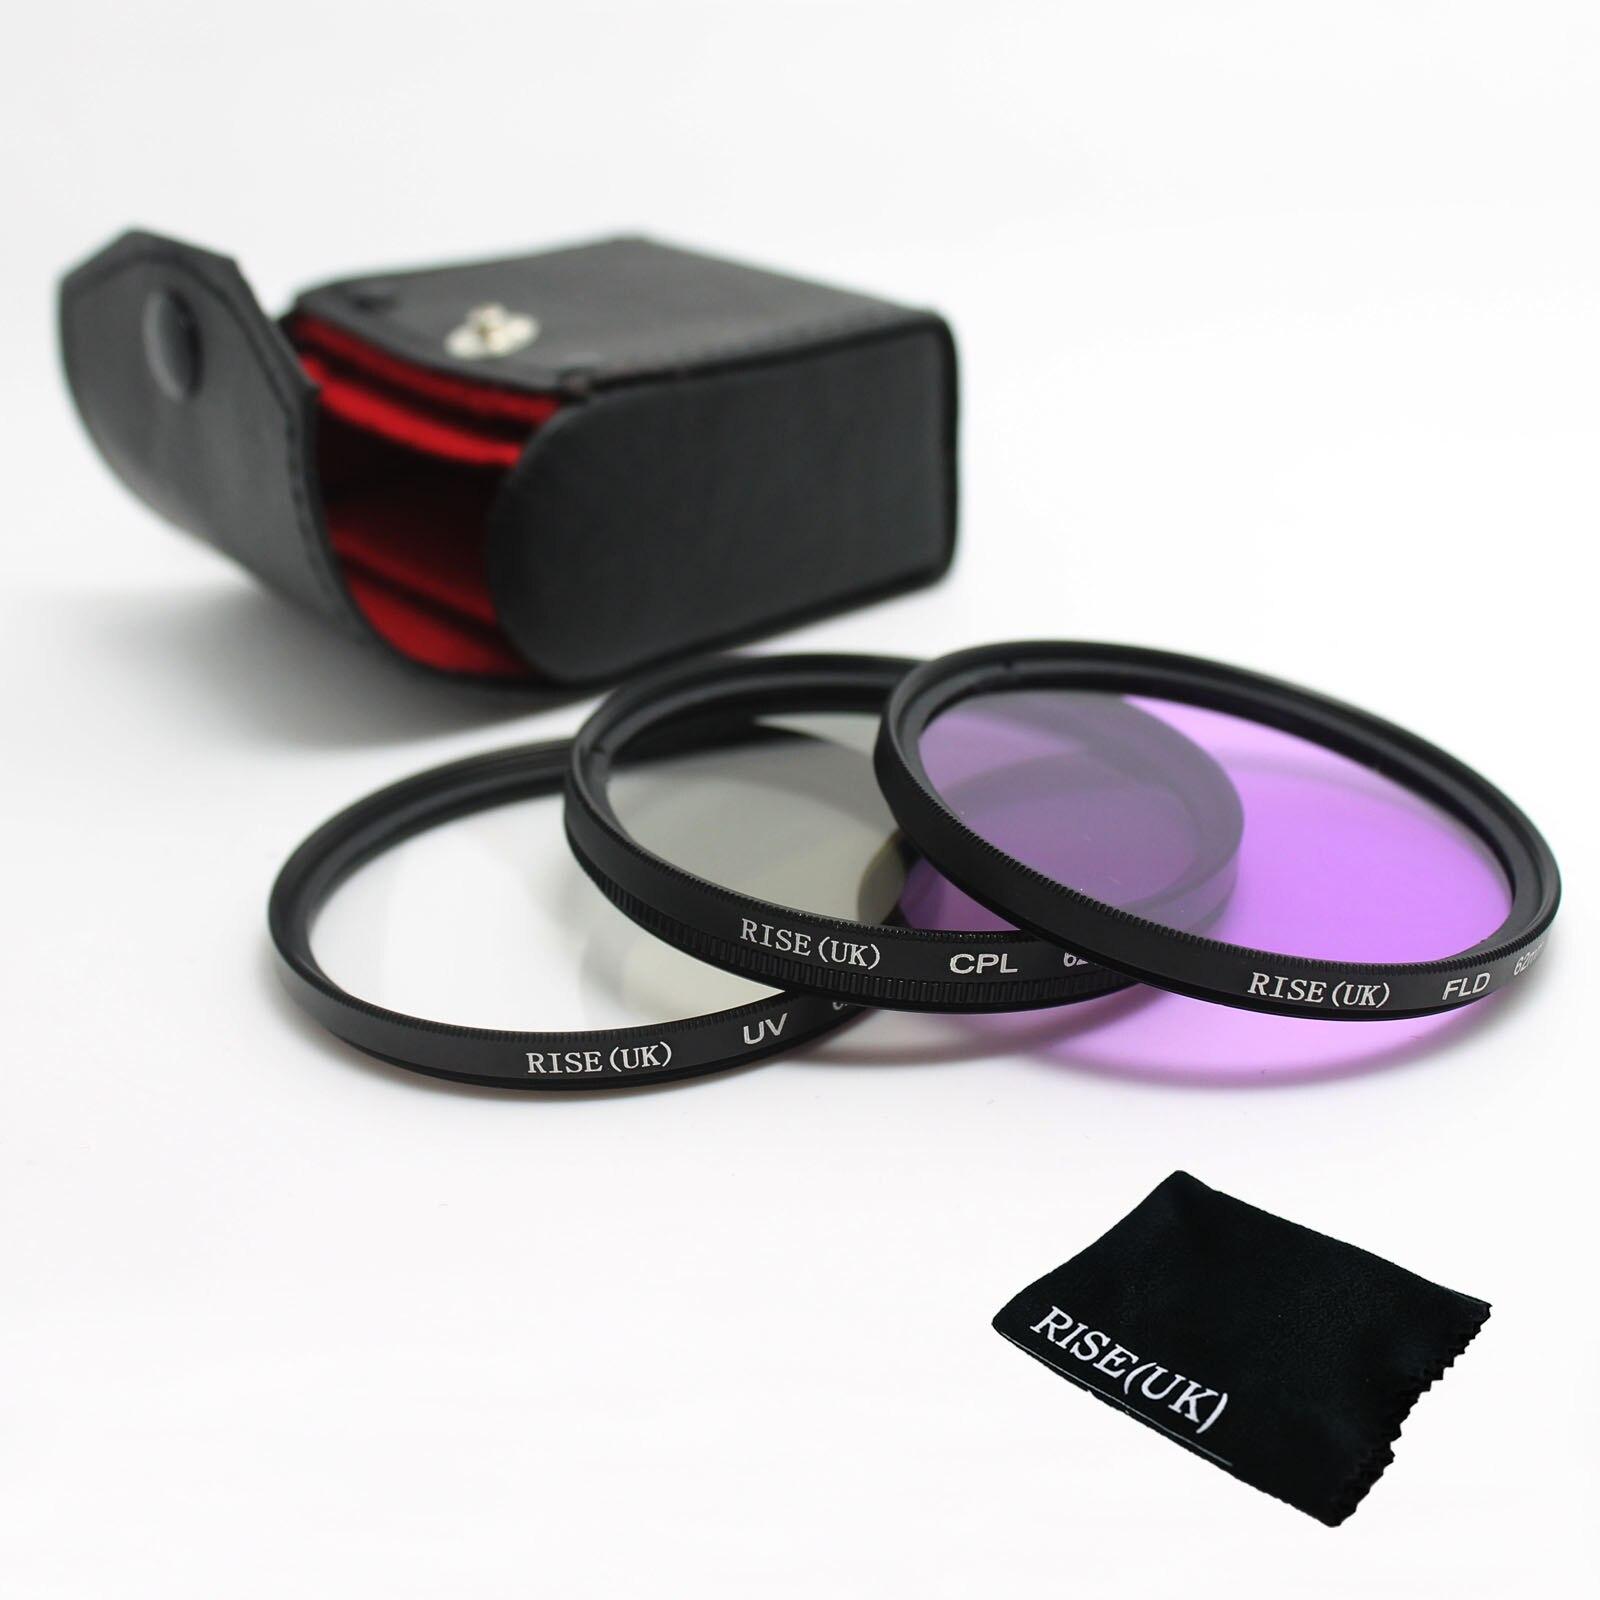 RISE (UK) 49mm 52mm 55mm 58mm 62mm 67mm 72mm 77mm UV + FLD + CPL Lens Filter Protector per canon nikon pentax sony dslr camera